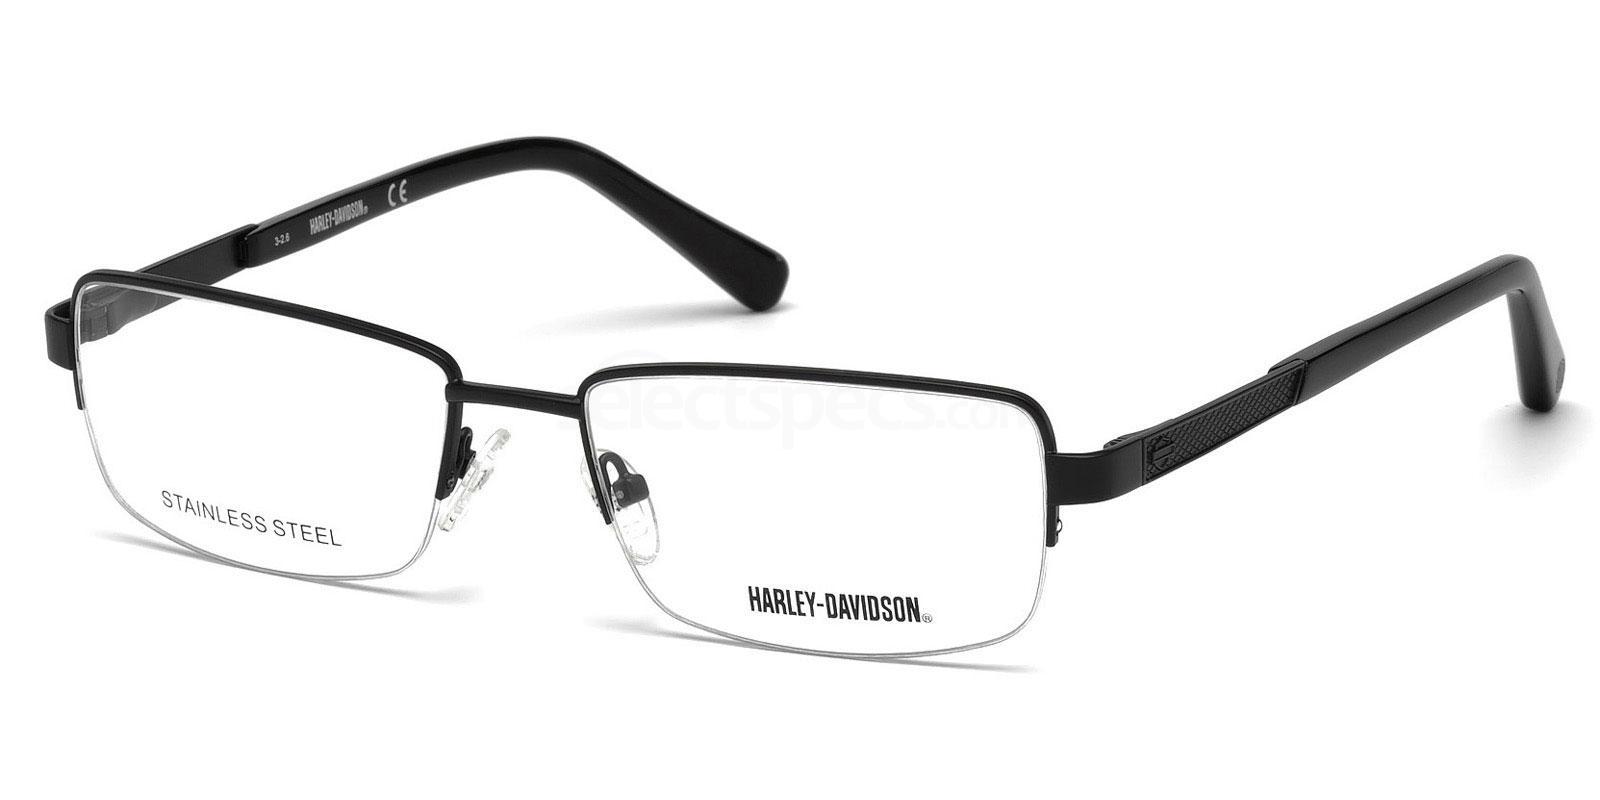 002 HD0750 Glasses, Harley Davidson